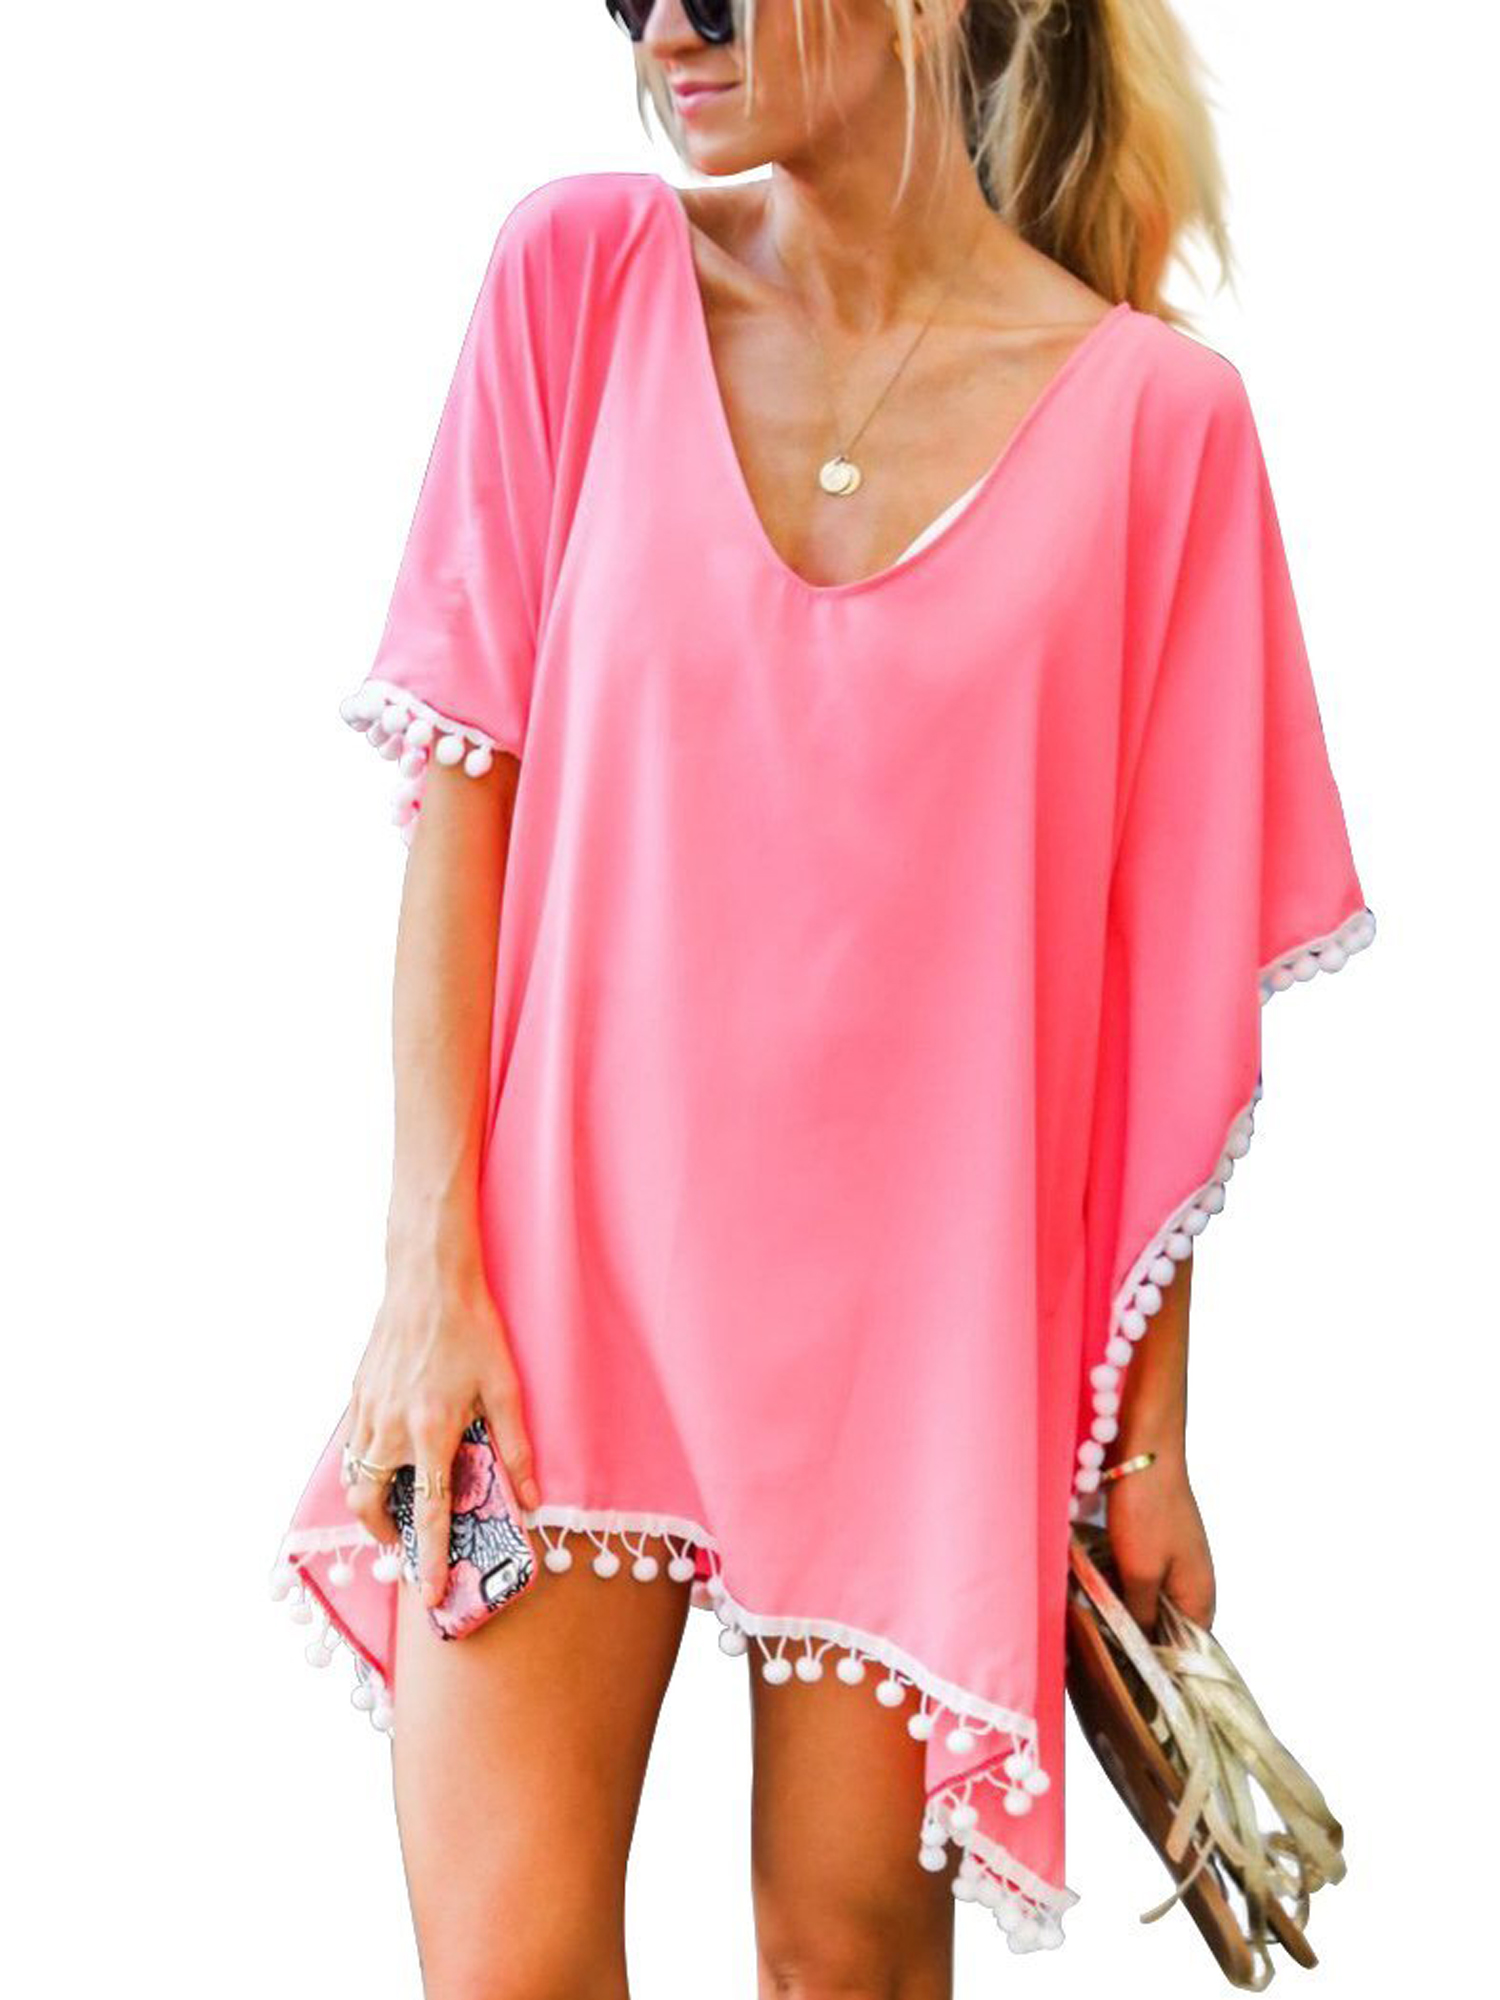 Beach Bikini Cover up Wrap Women Swimwear V Neck Loose Fit Short Dress with Tassels Boho style Poncho Trim Kaftan Loose Beachwear